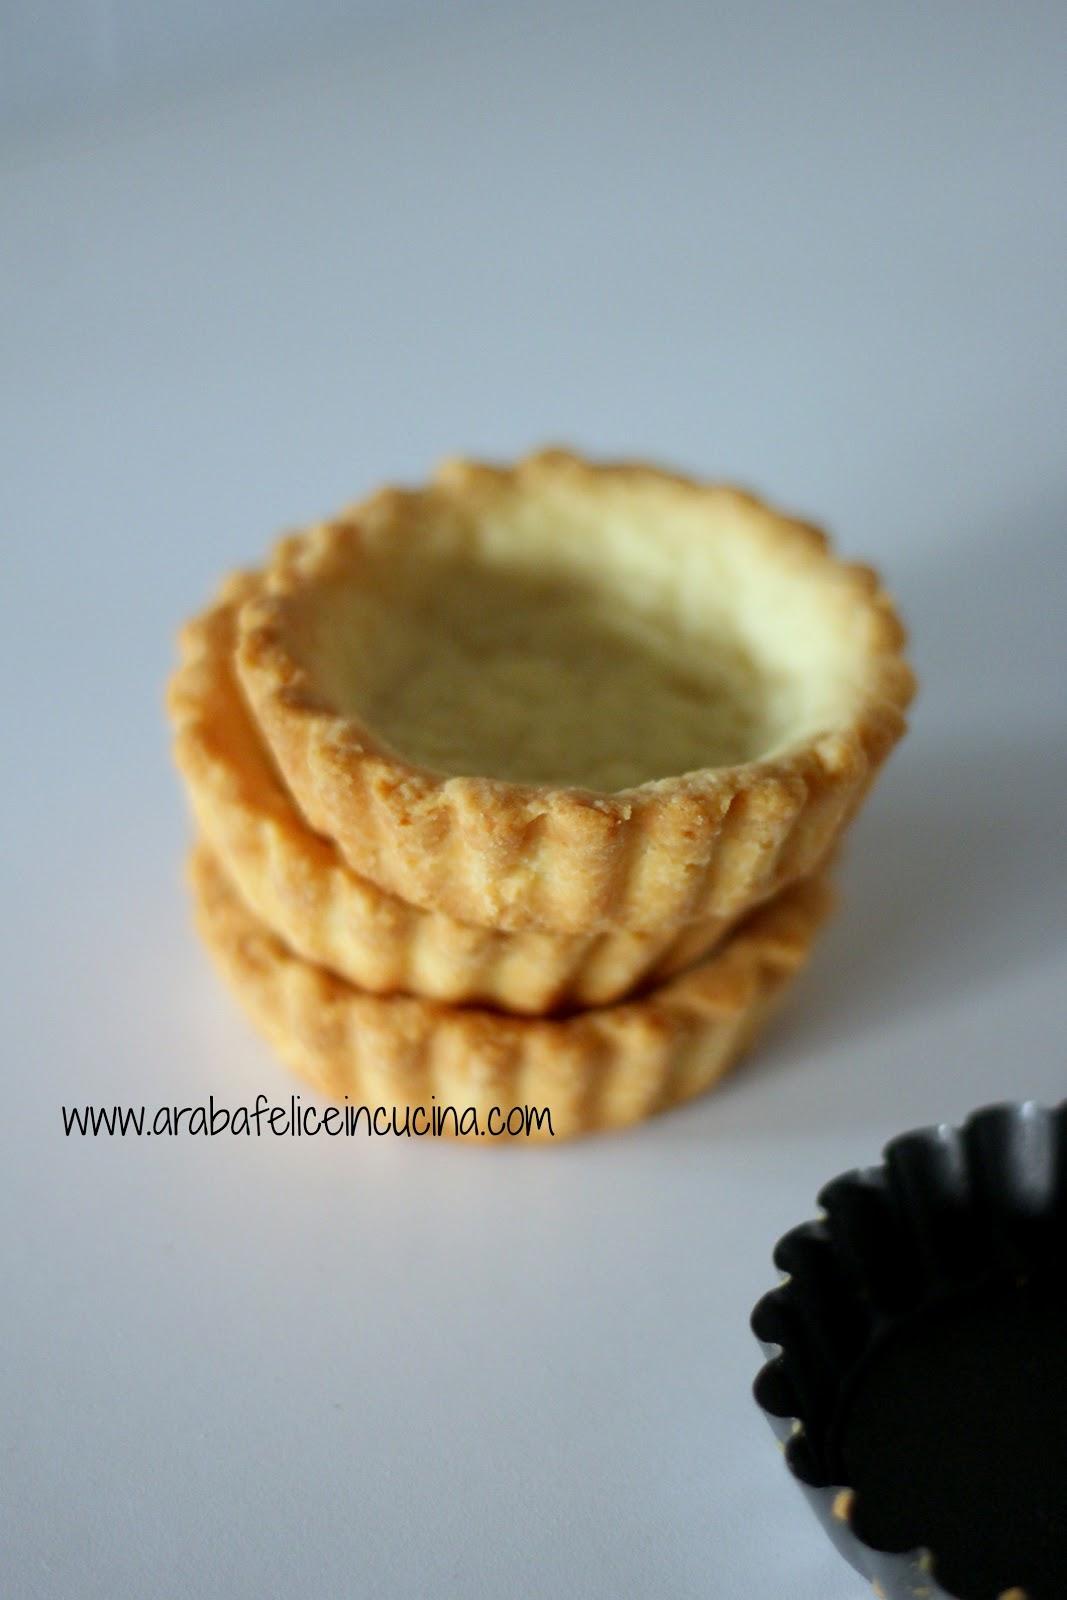 Arabafelice in cucina!: la crostata con la frolla...matta!